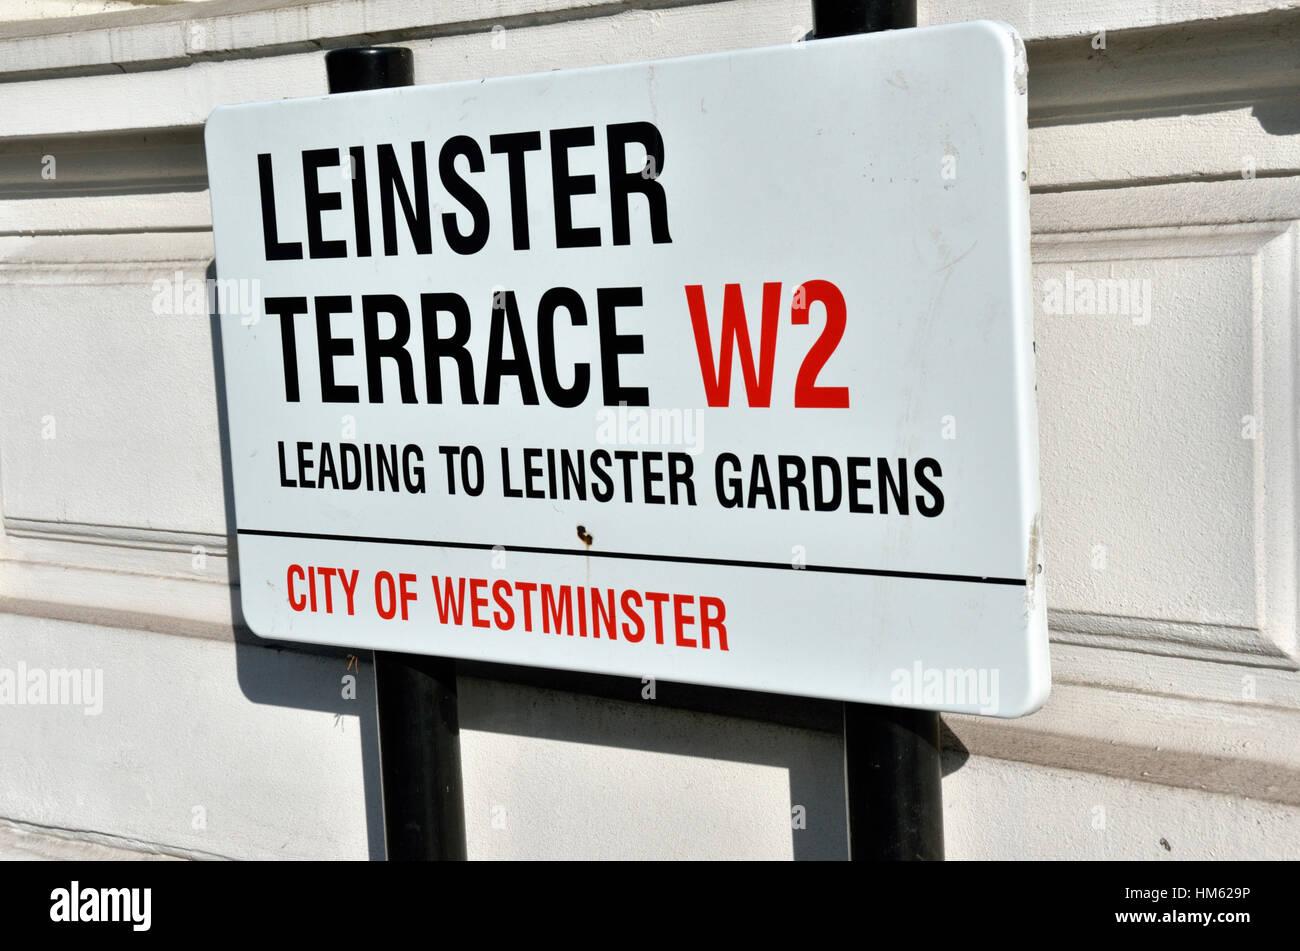 Leinster Terrace W2 street sign, London, UK - Stock Image